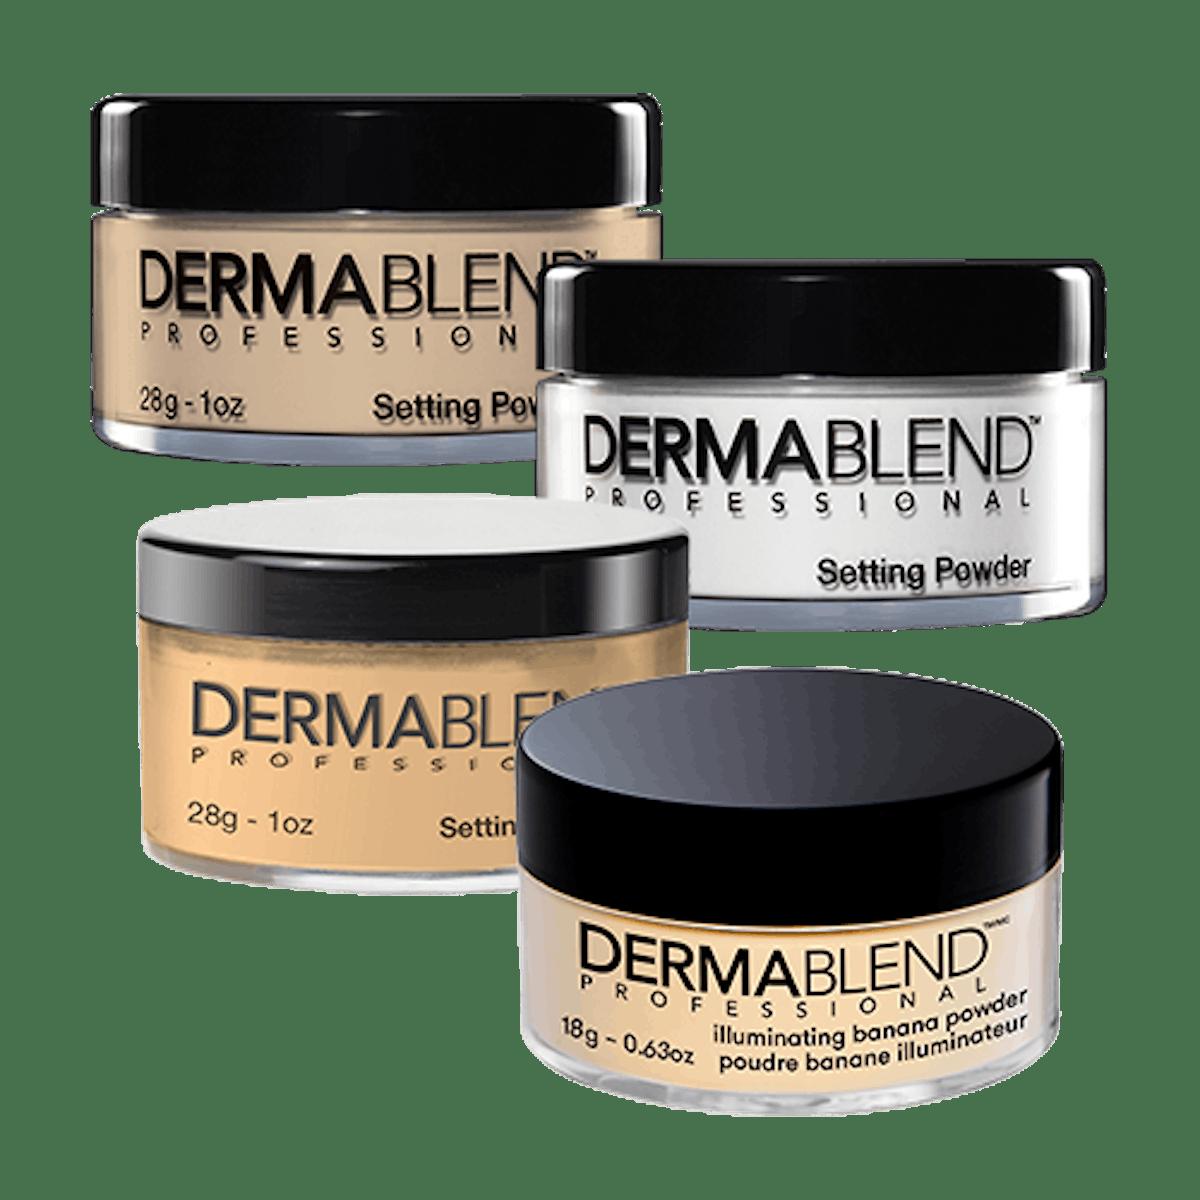 Dermablend Setting Powders